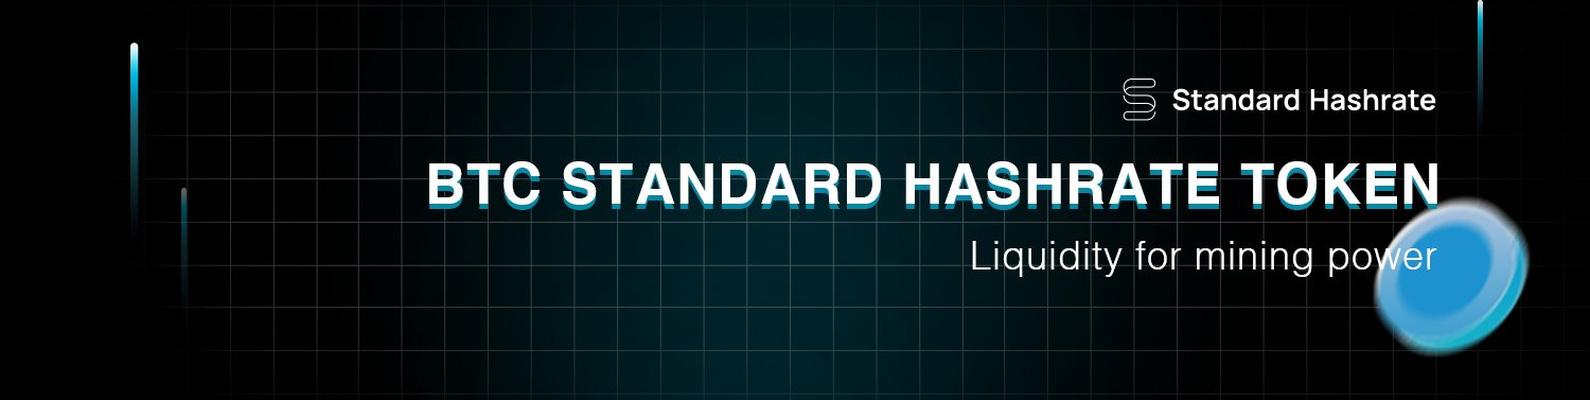 standard hashrate valore azioni cd projekt red